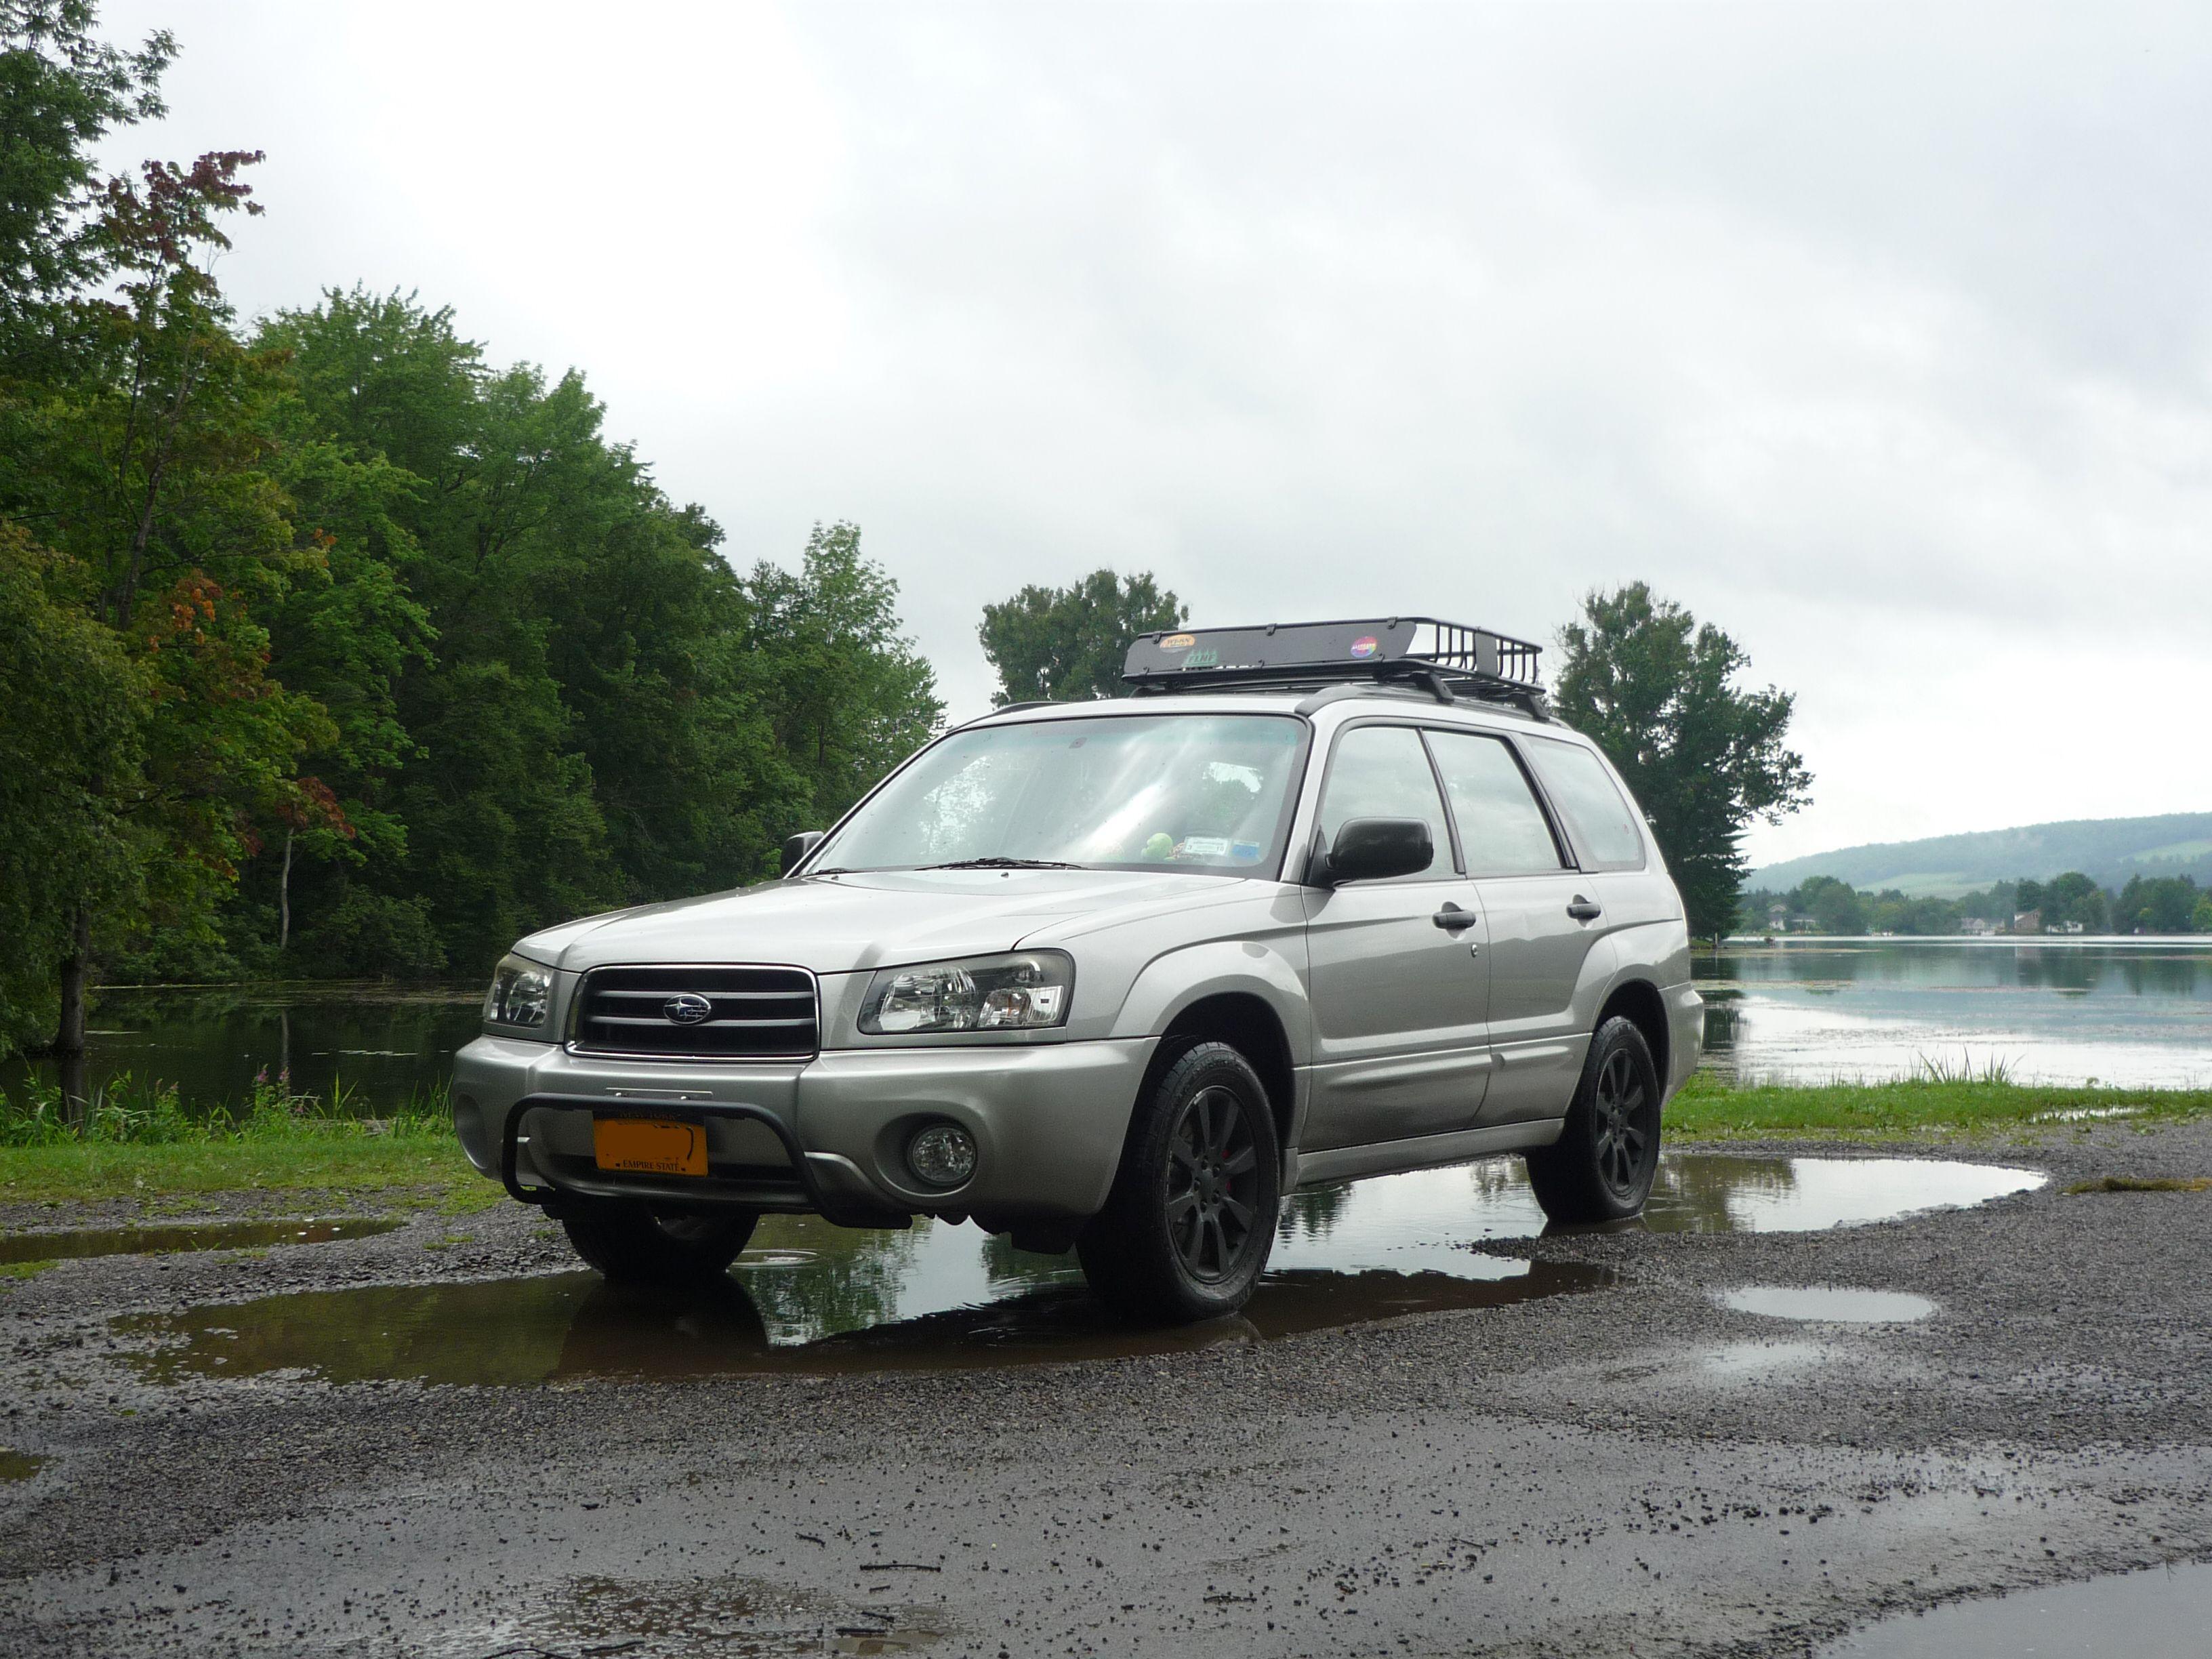 2005 Subaru Forester Xs Outdoorsubarus Gosubaruing